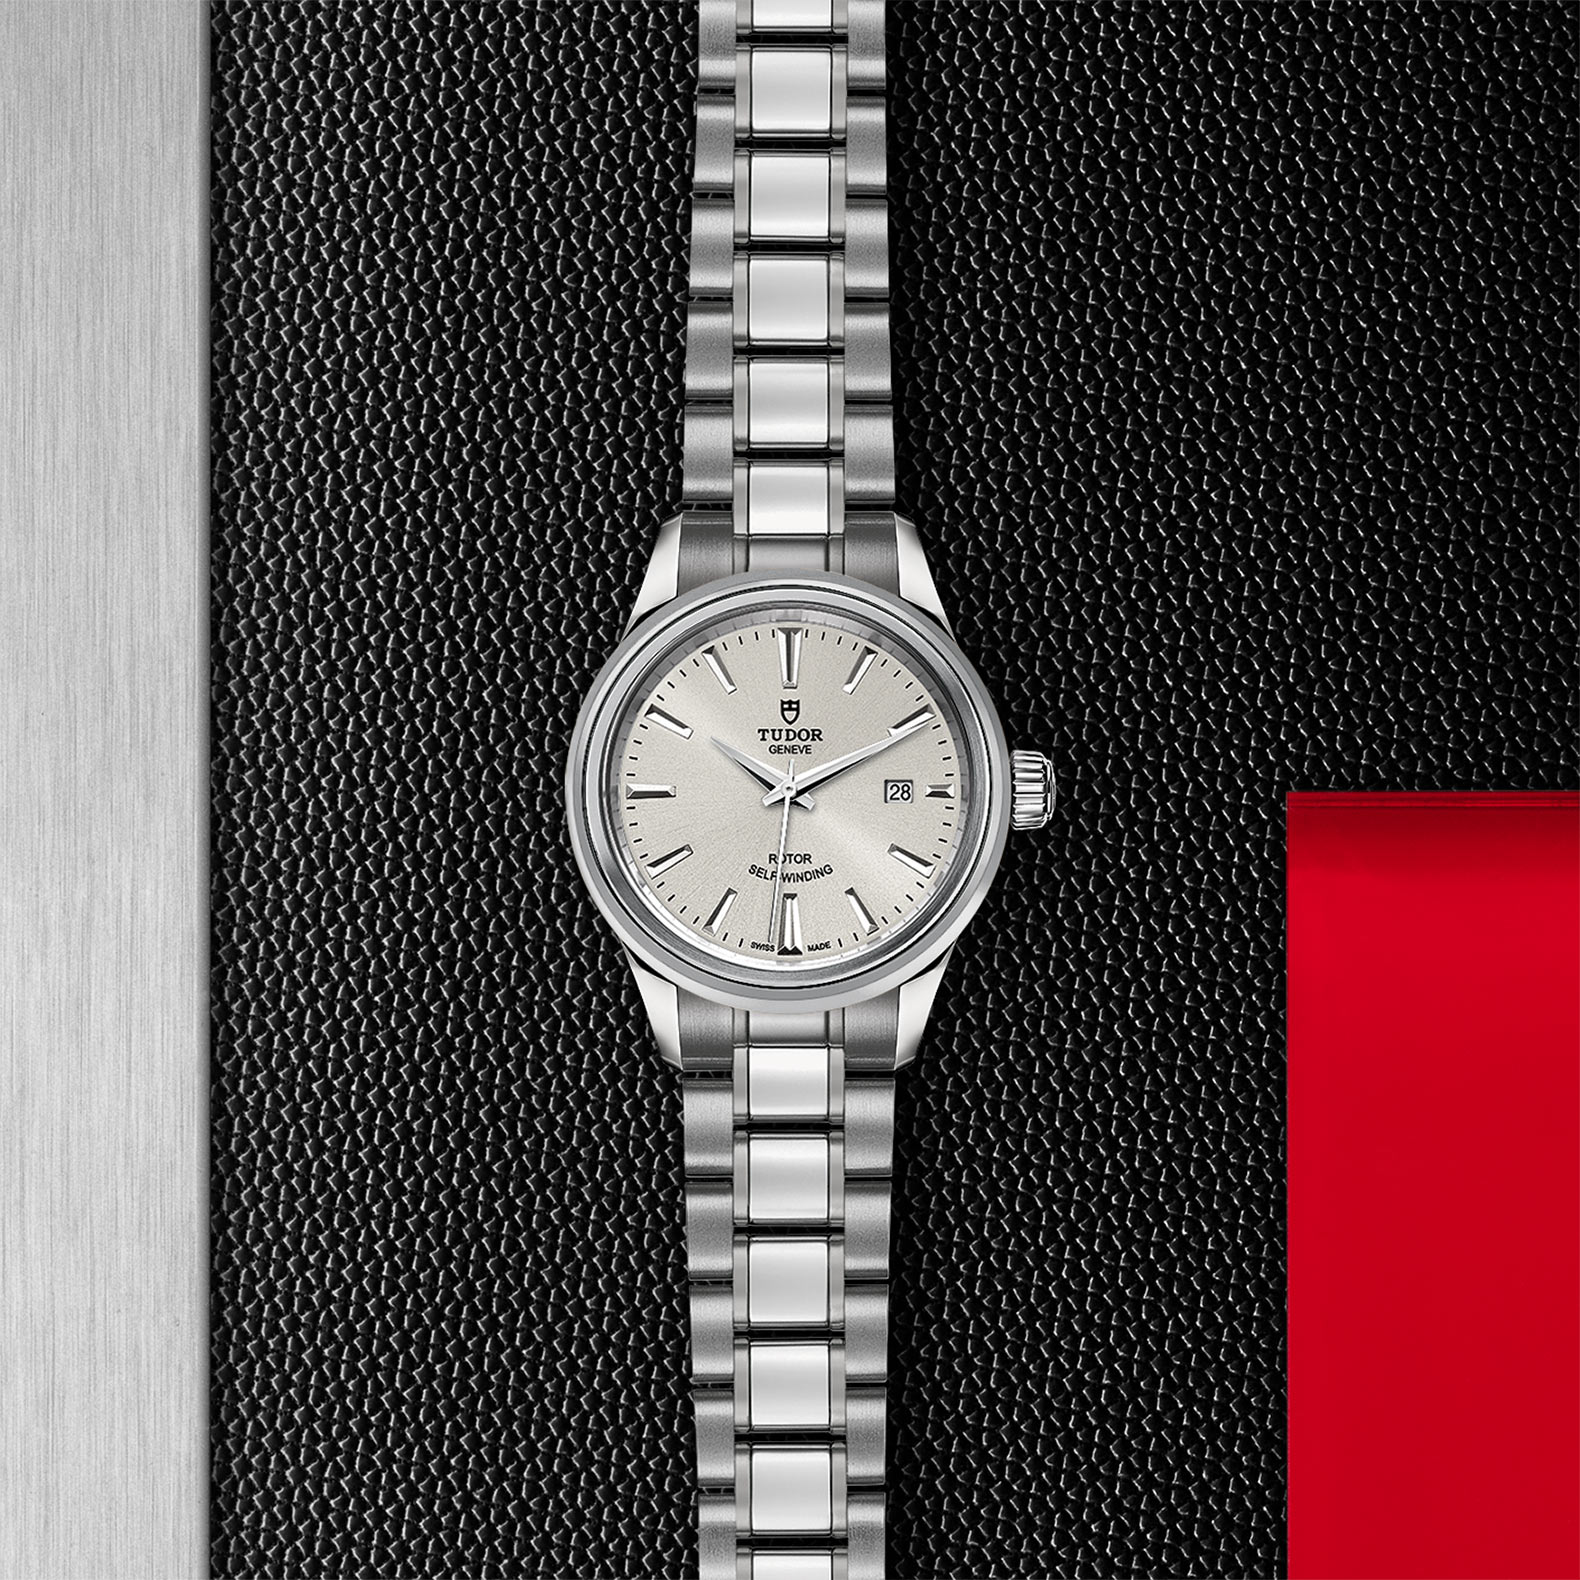 TUDOR Style - M12100-0001